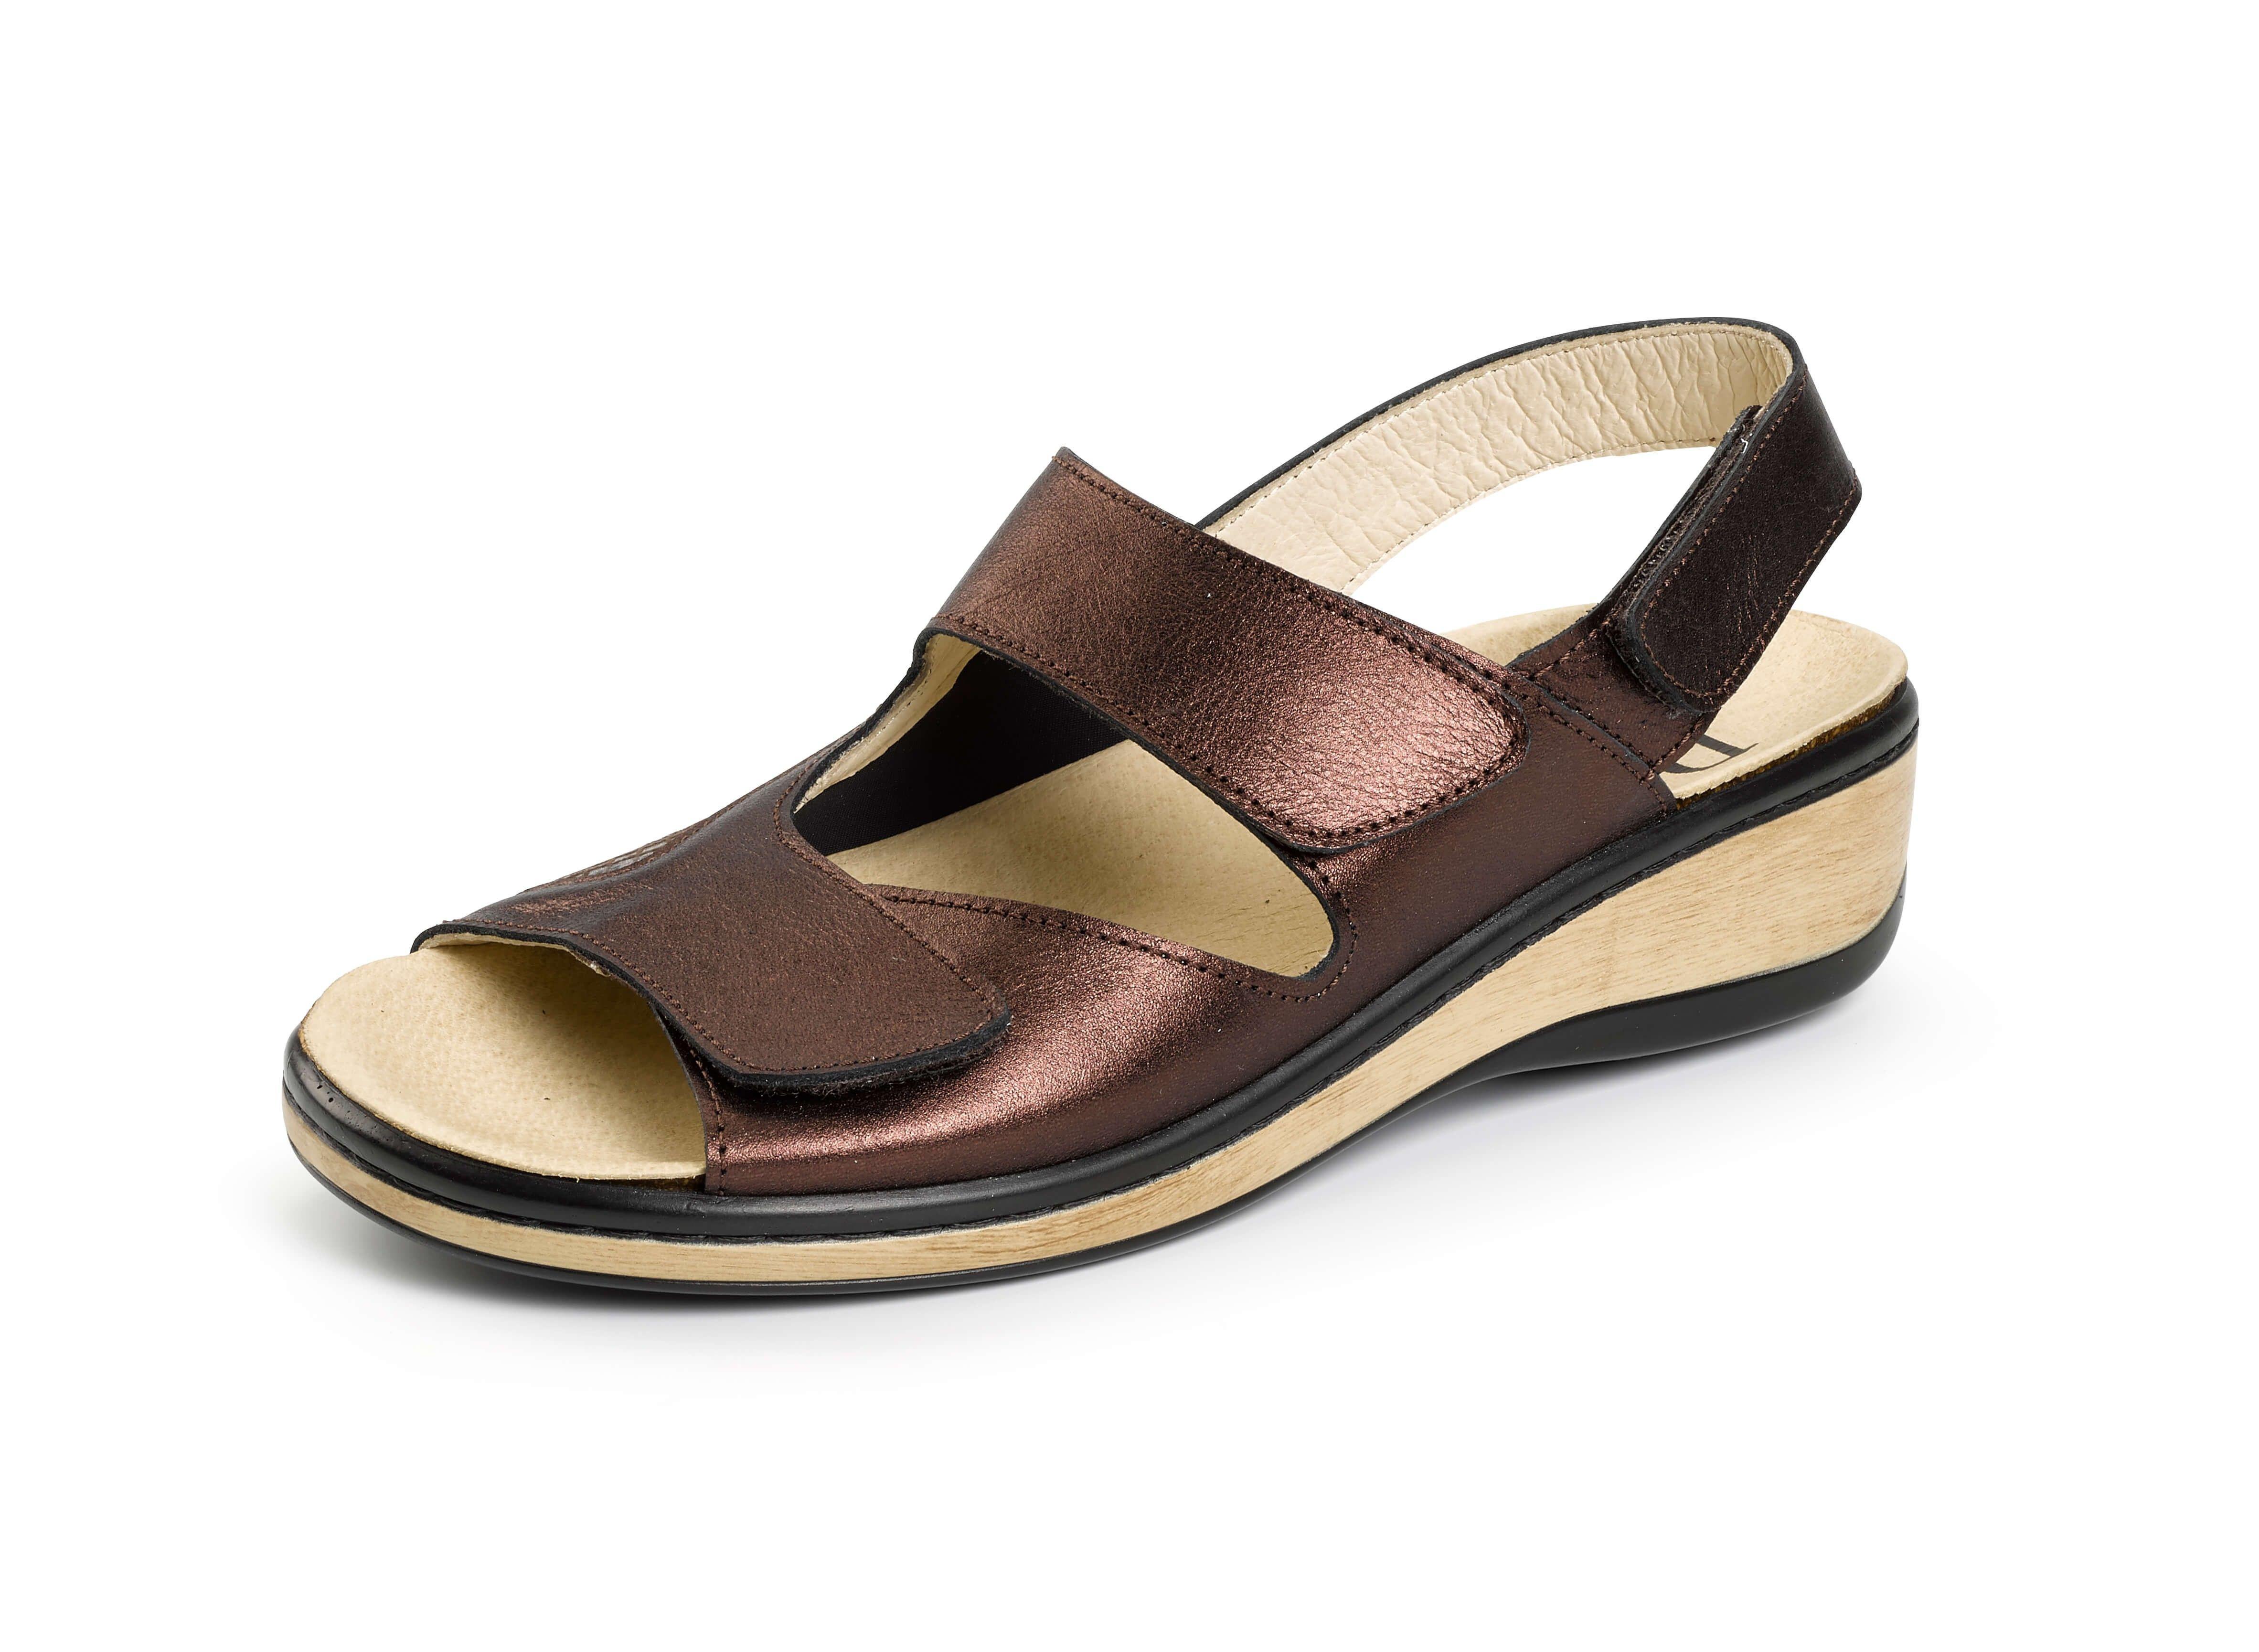 Especial Sandalia Con Bronce De Daimar Juanetes Velcro zpjqUGLSMV